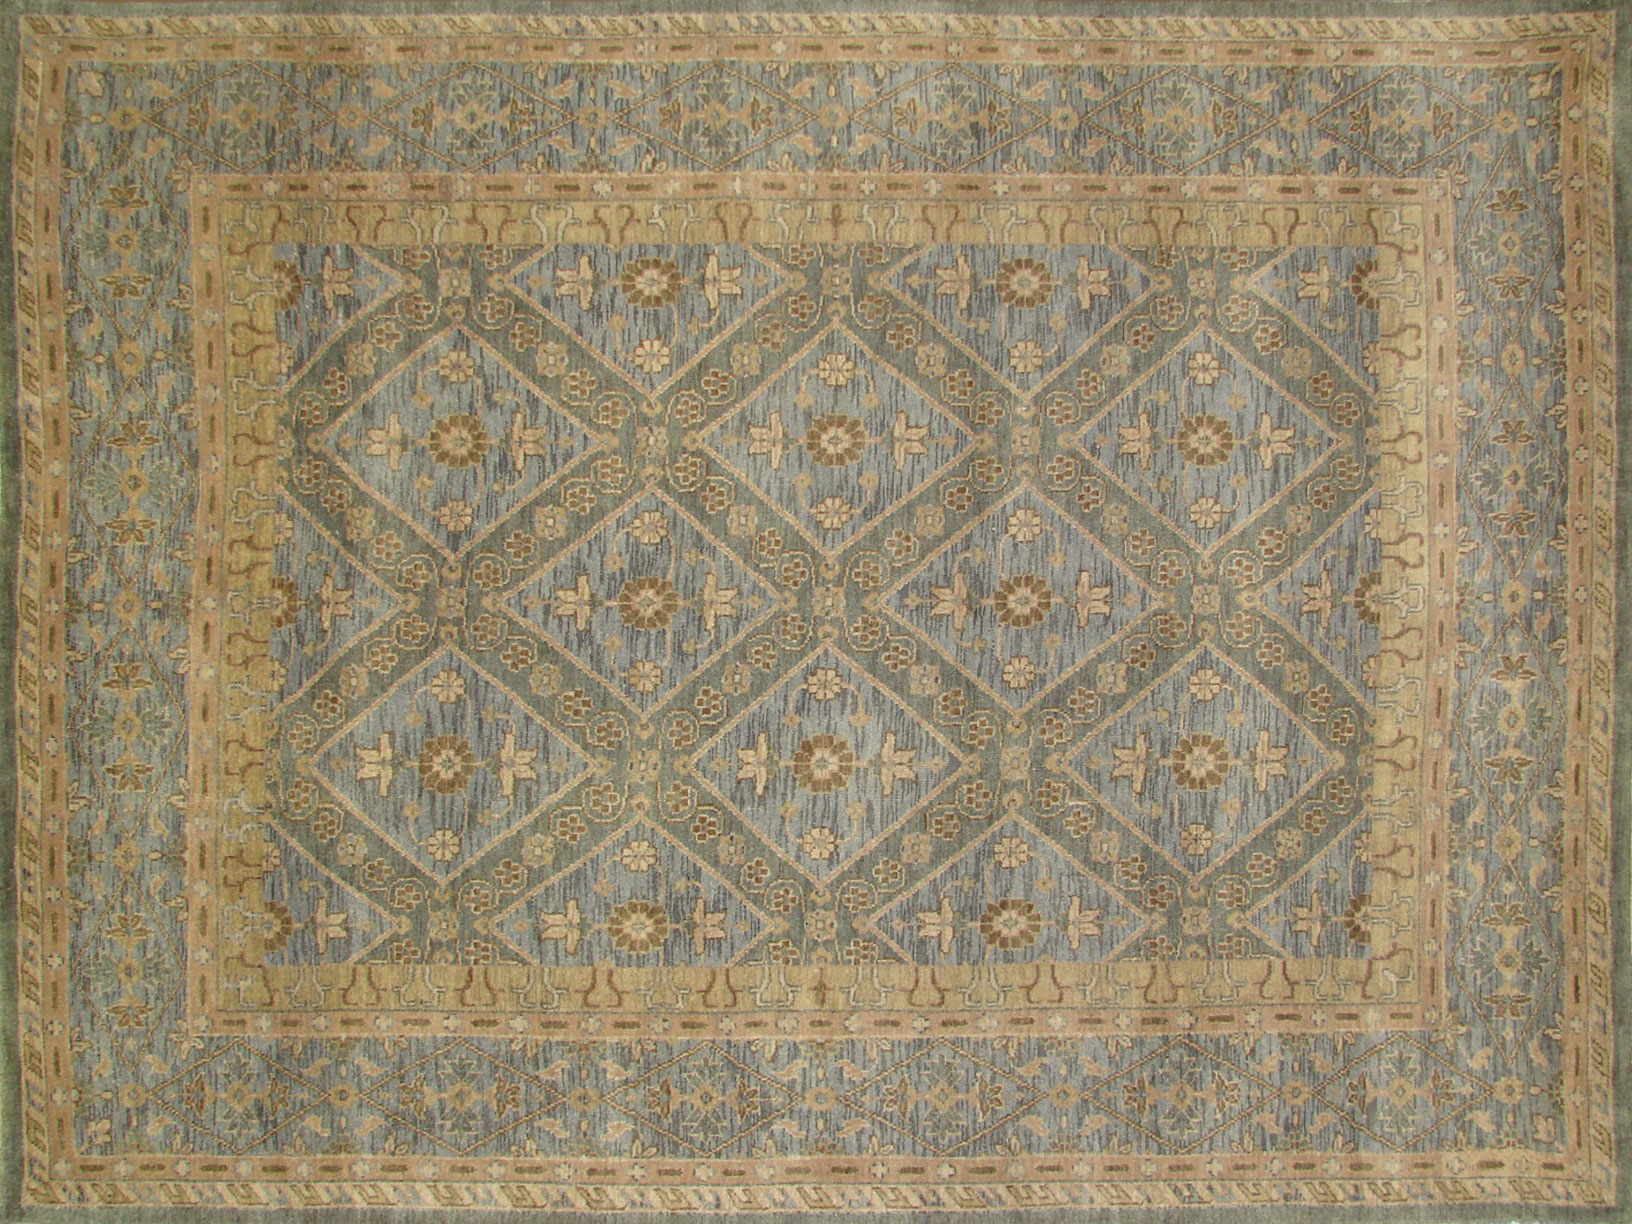 8x10 Heriz/Serapi Hand Knotted Wool Area Rug - MR18545